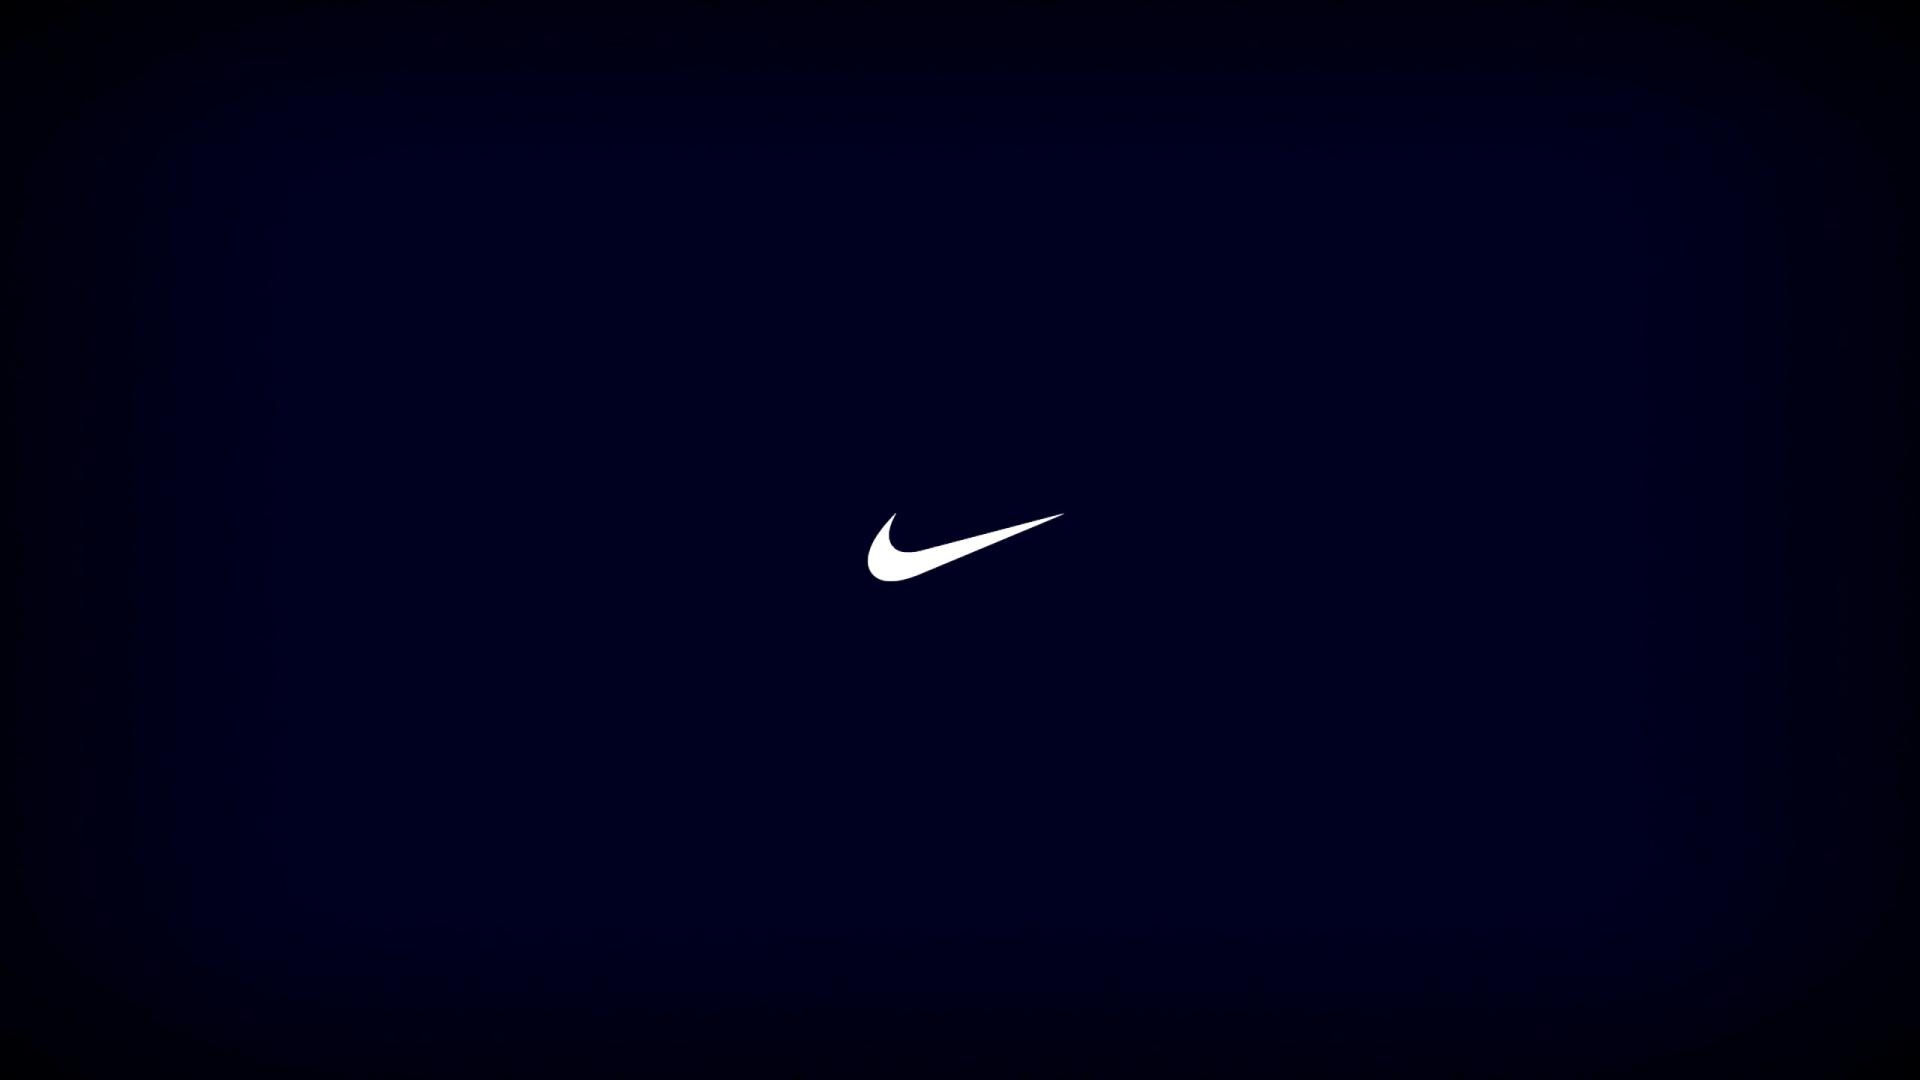 Nike Logo Gray Background Wallpaper Download 6940 1920x1080